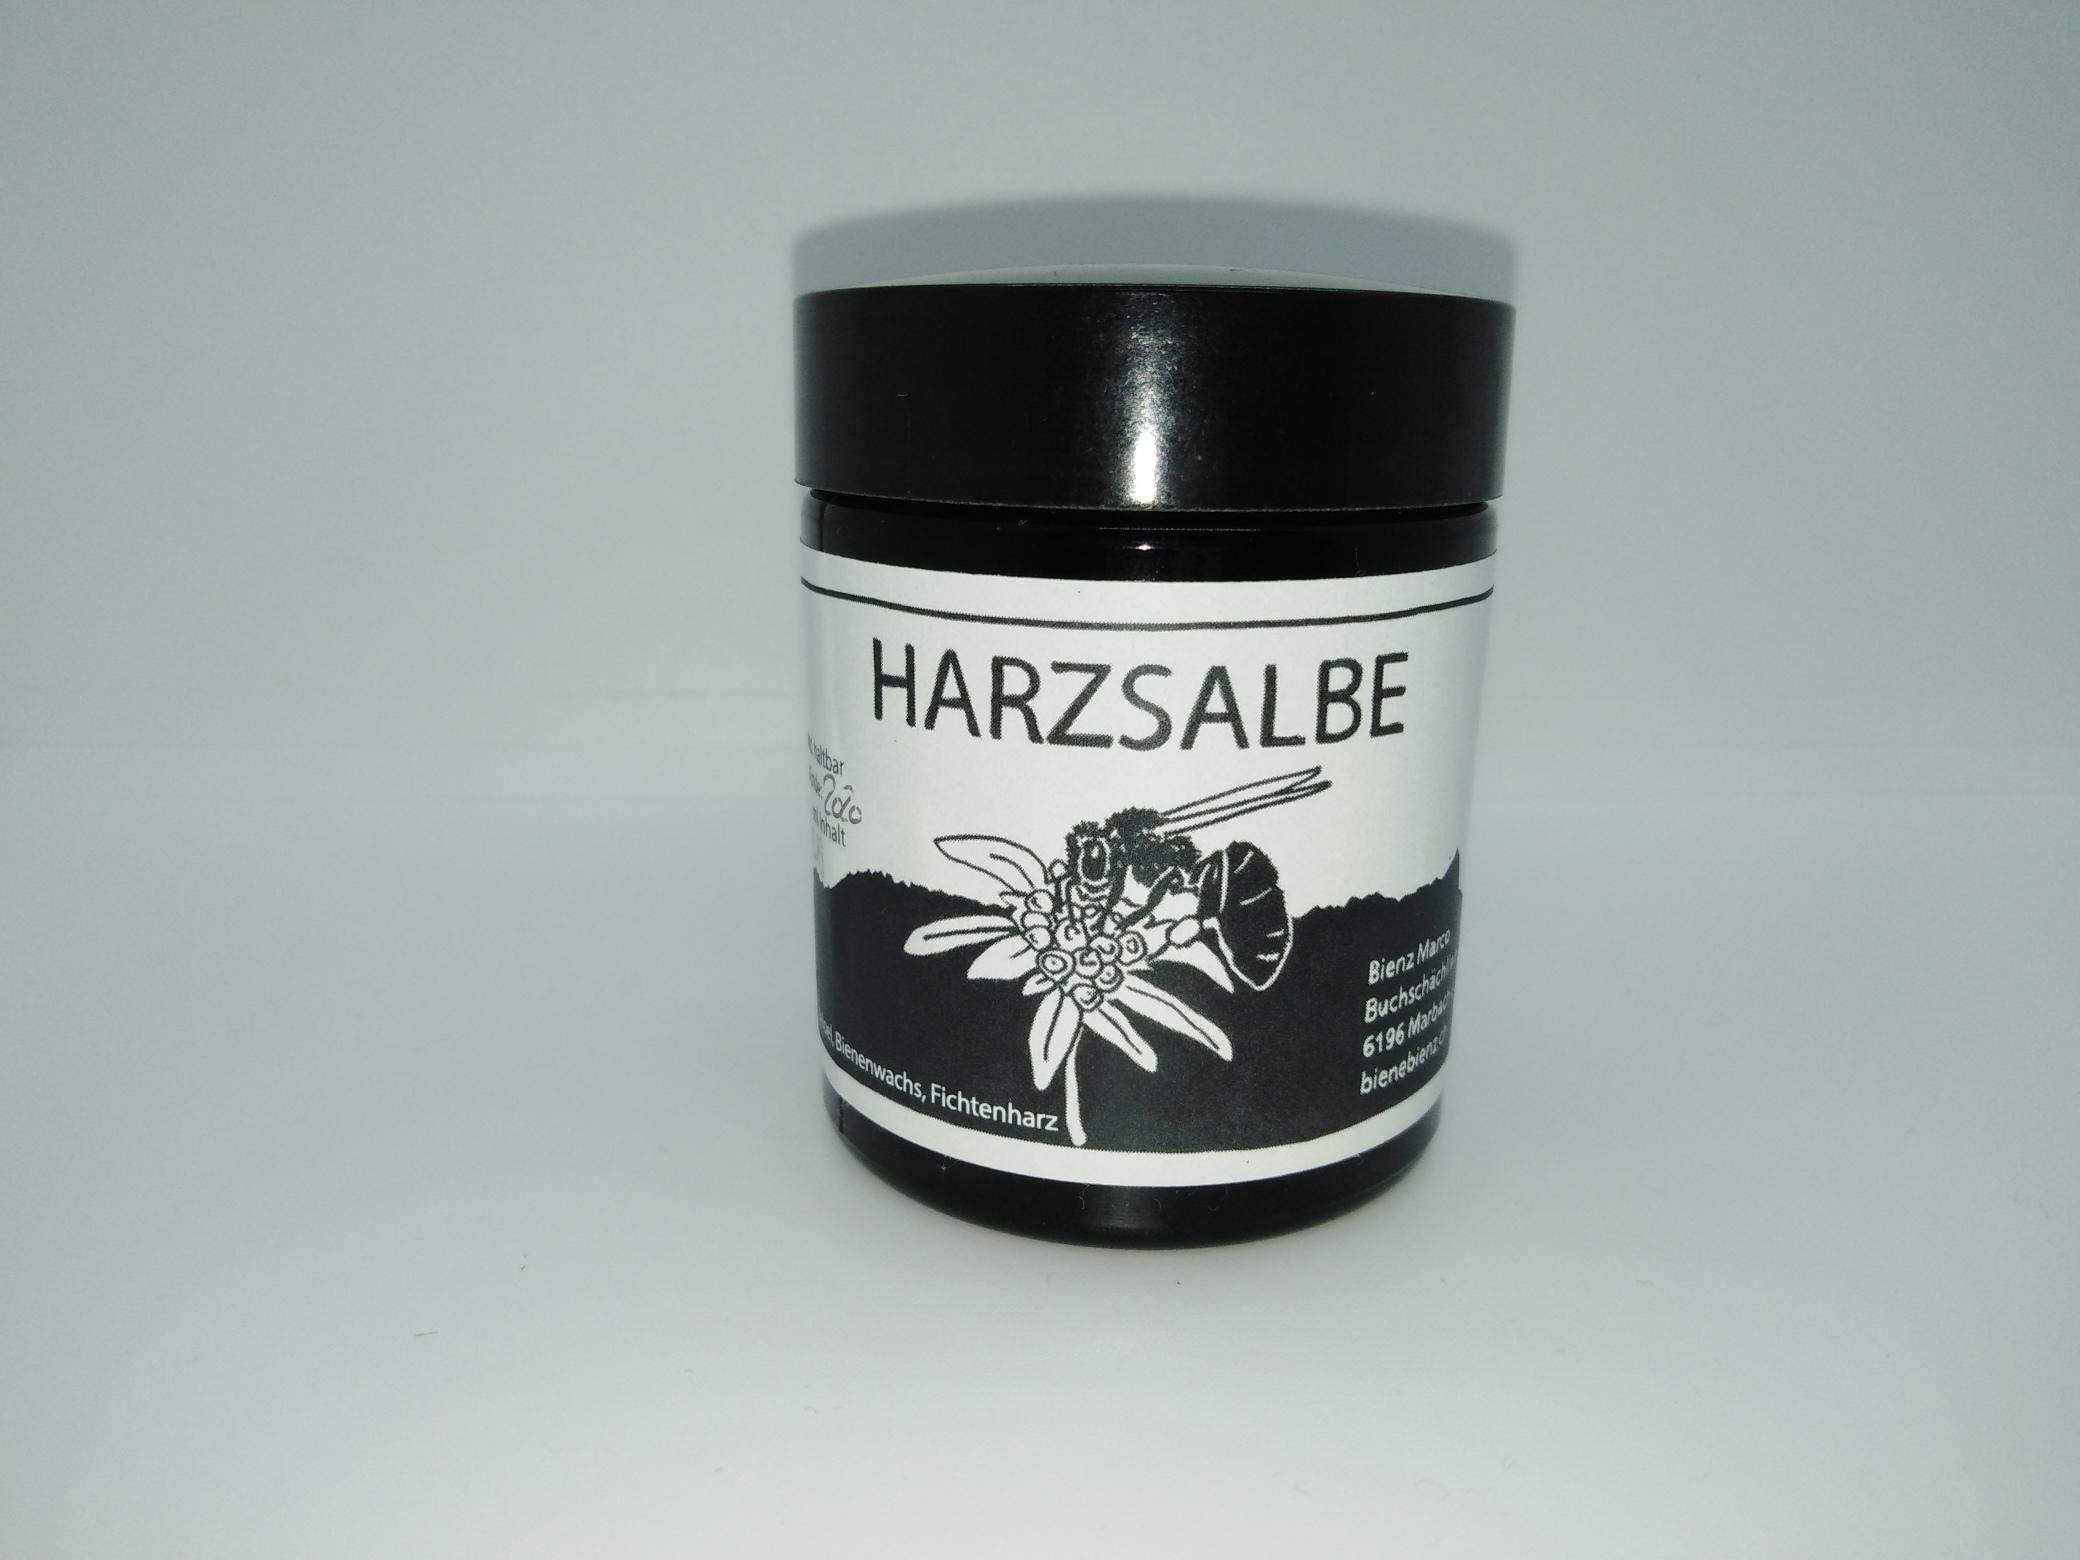 Harzsalbe